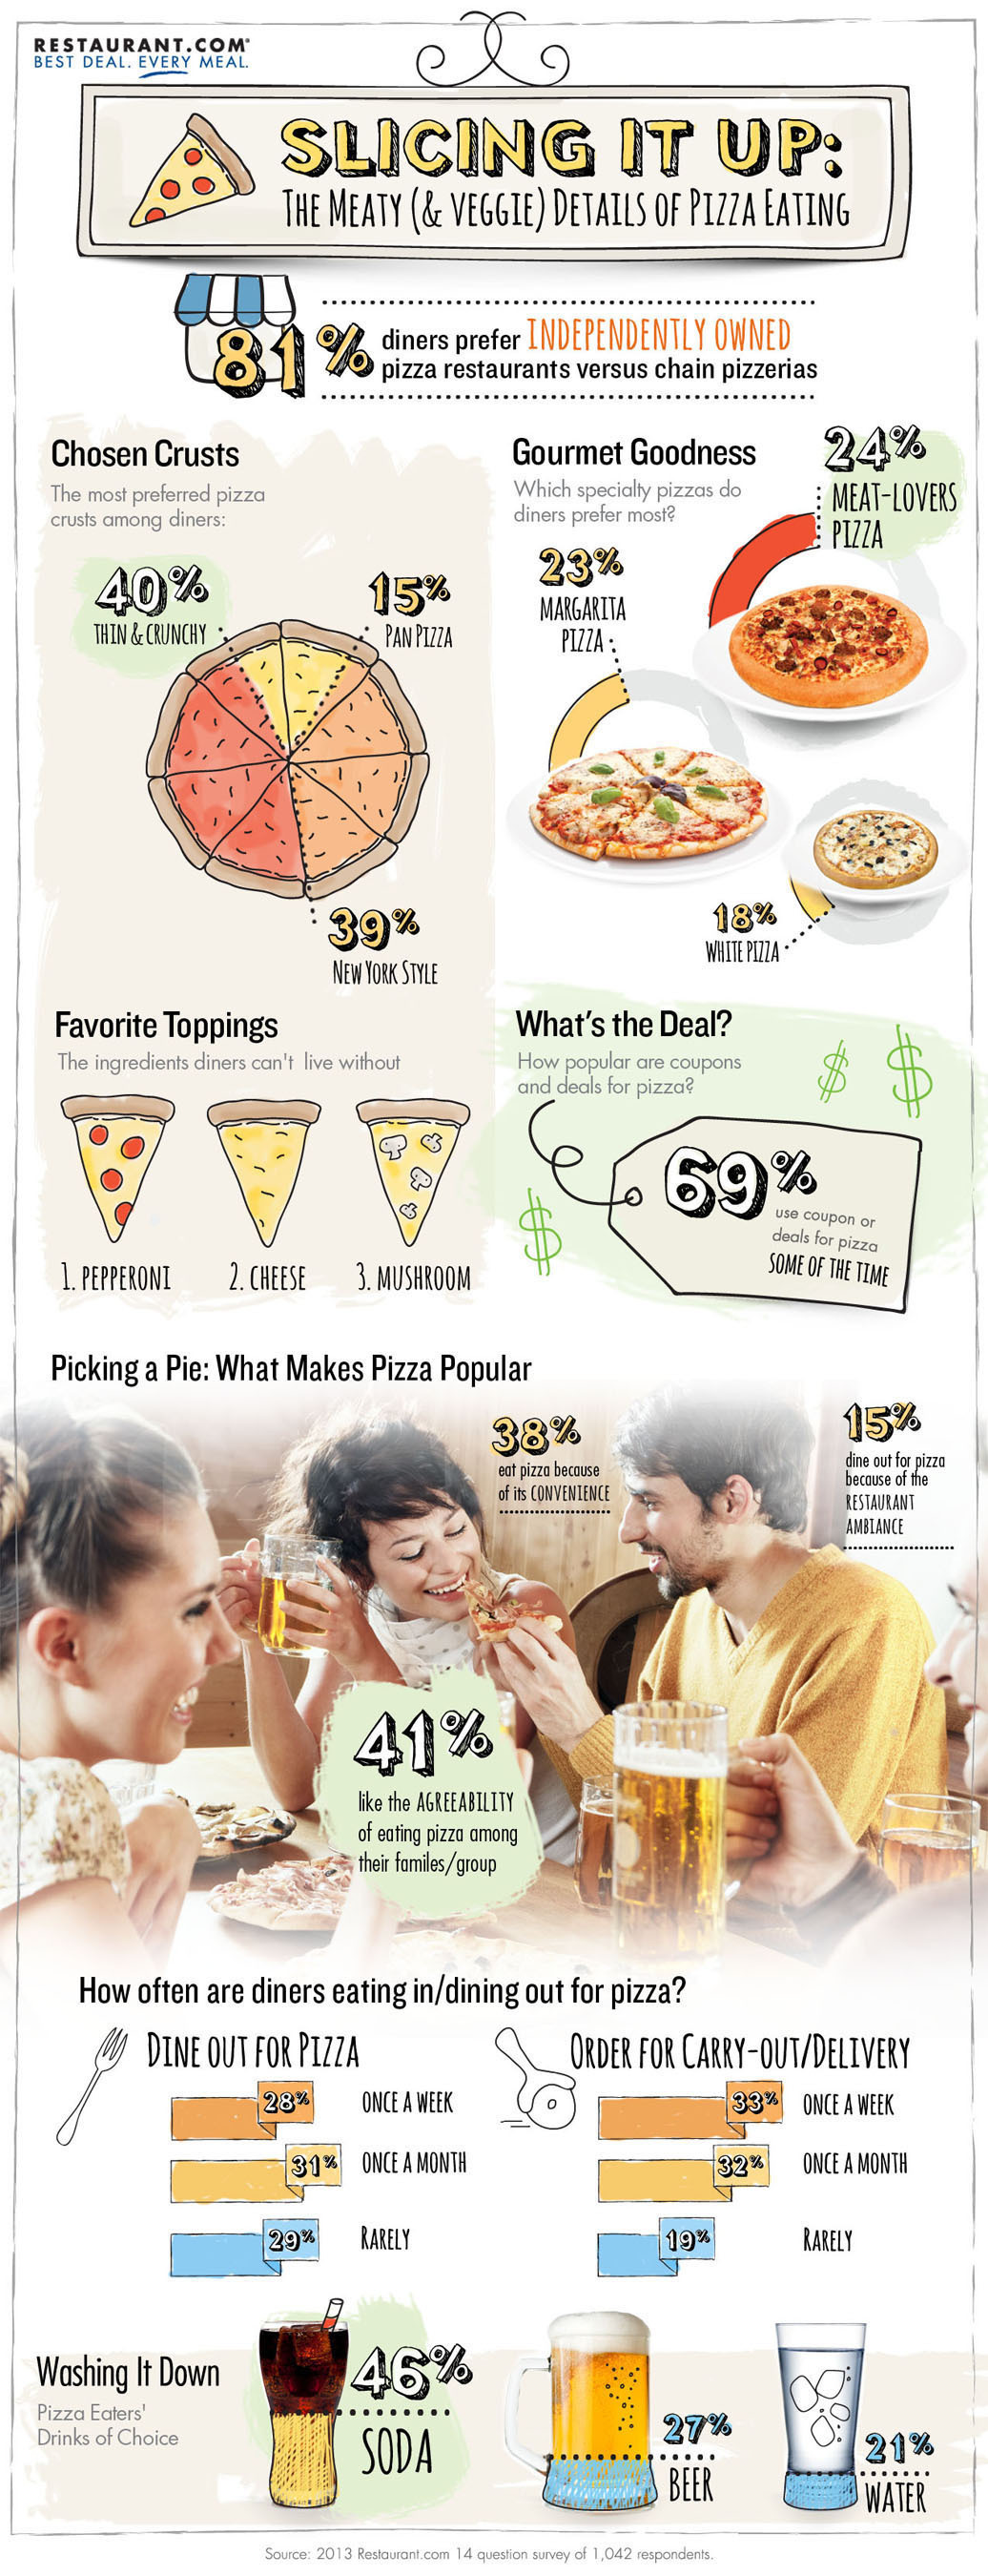 Restaurant.com Slices It Up: The Meaty (& Veggie) Details of Pizza Eating!  (PRNewsFoto/Restaurant.com)